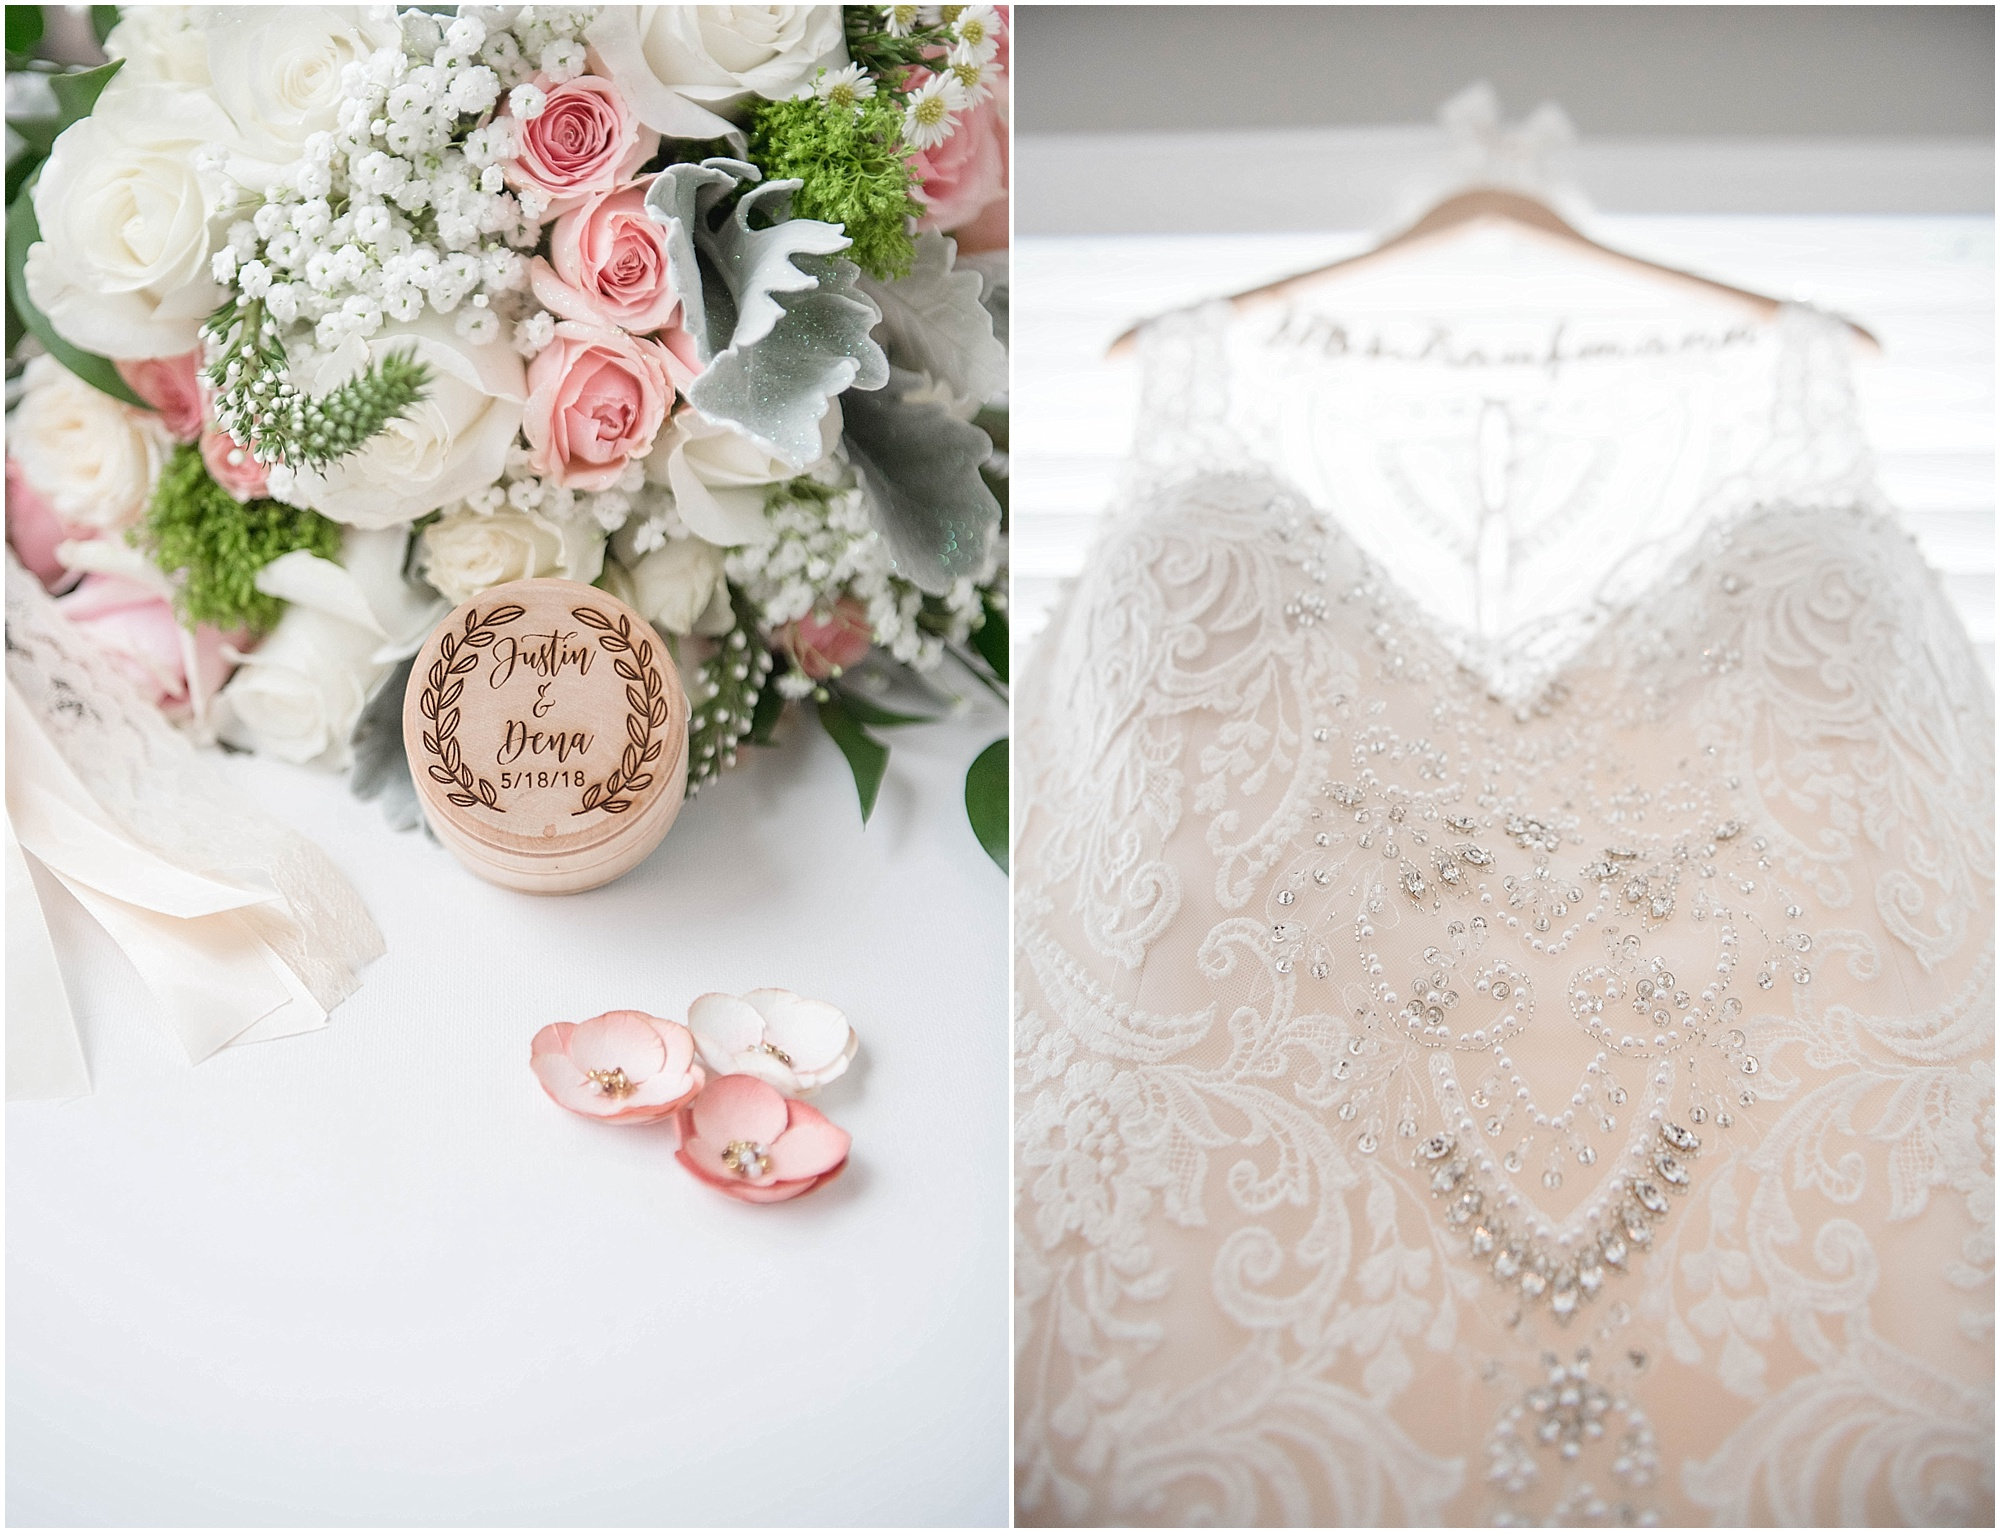 Adivas Photography Luxury Boutique Wedding Service_0775.jpg